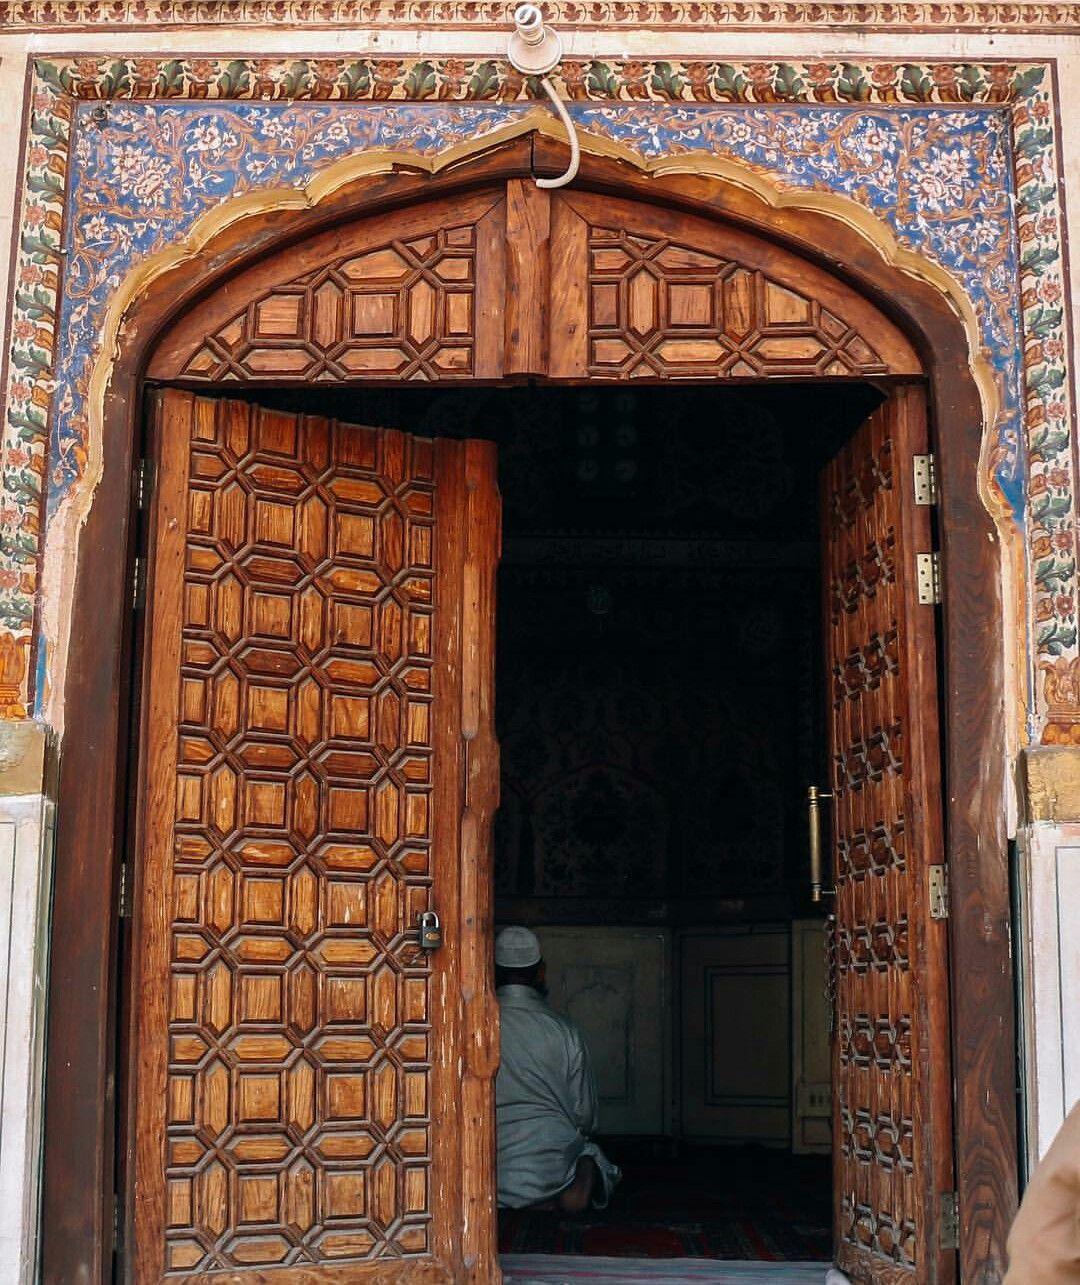 Sunehri Masjid Lahore Punjab Pakistan & Sunehri Masjid Lahore Punjab Pakistan   Pakistan   Pinterest ... pezcame.com